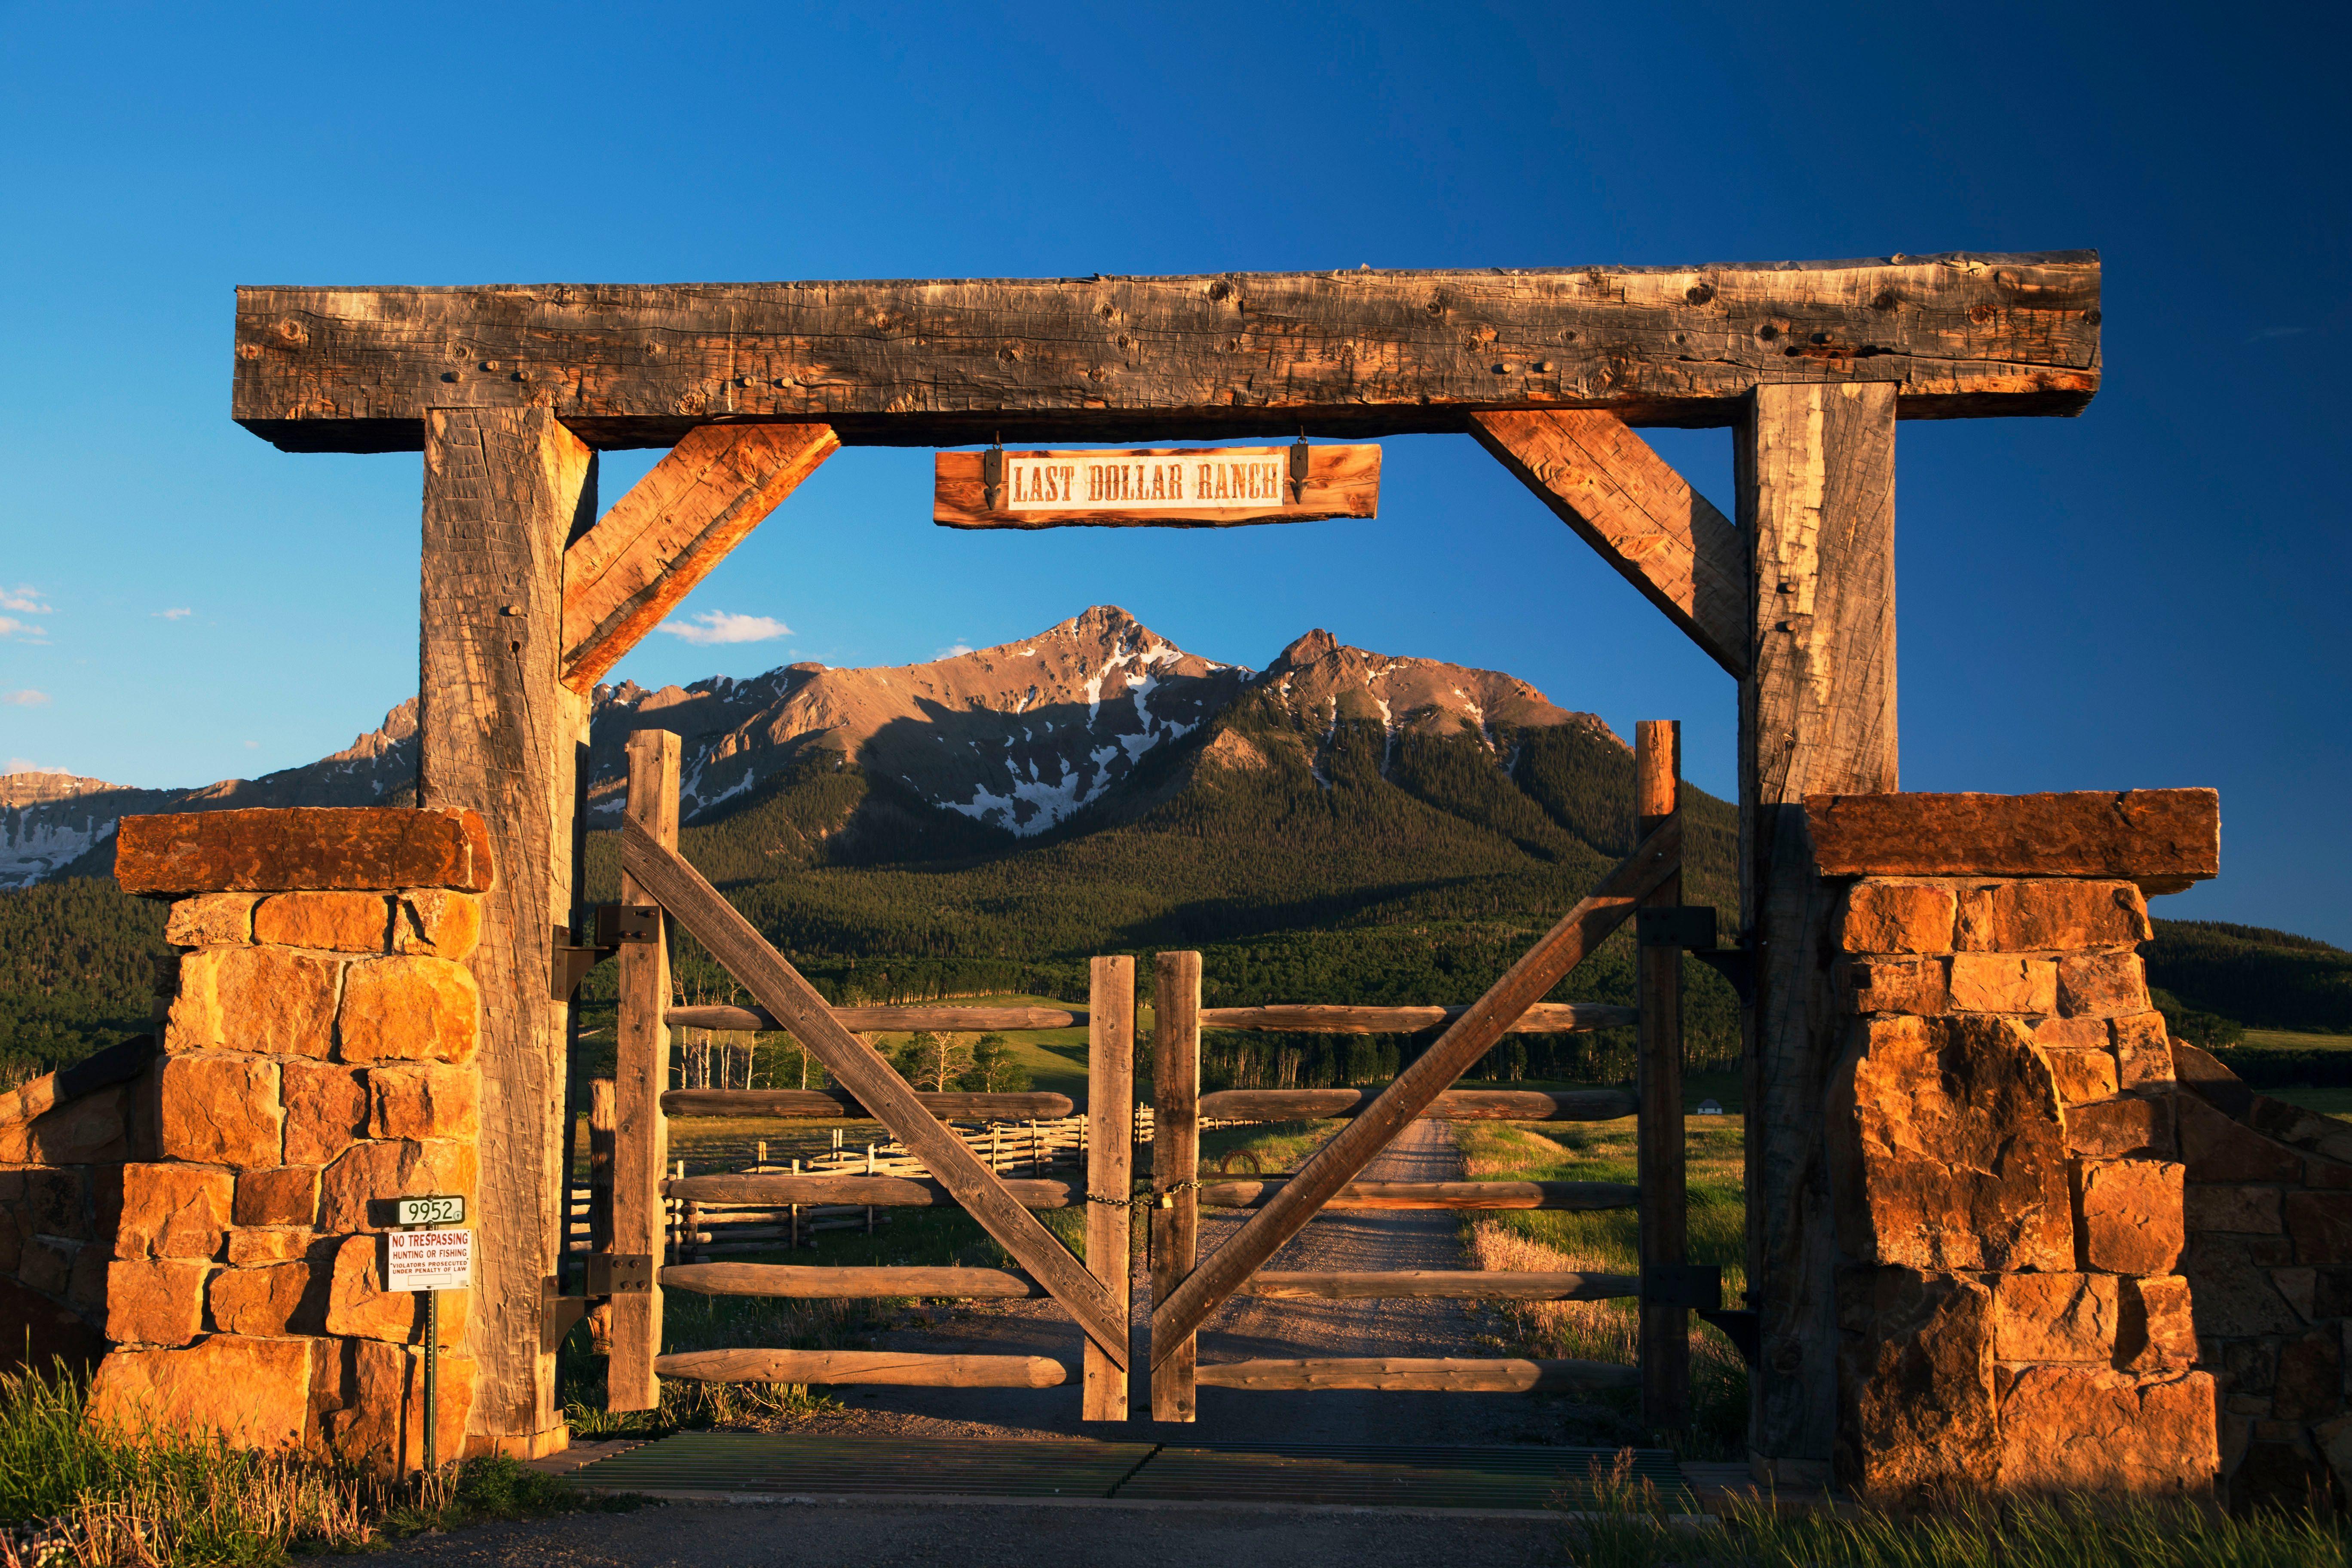 Historic Last Dollar Ranch gate, Hastings Mesa, Route 58p, near Ridgway, Colorado